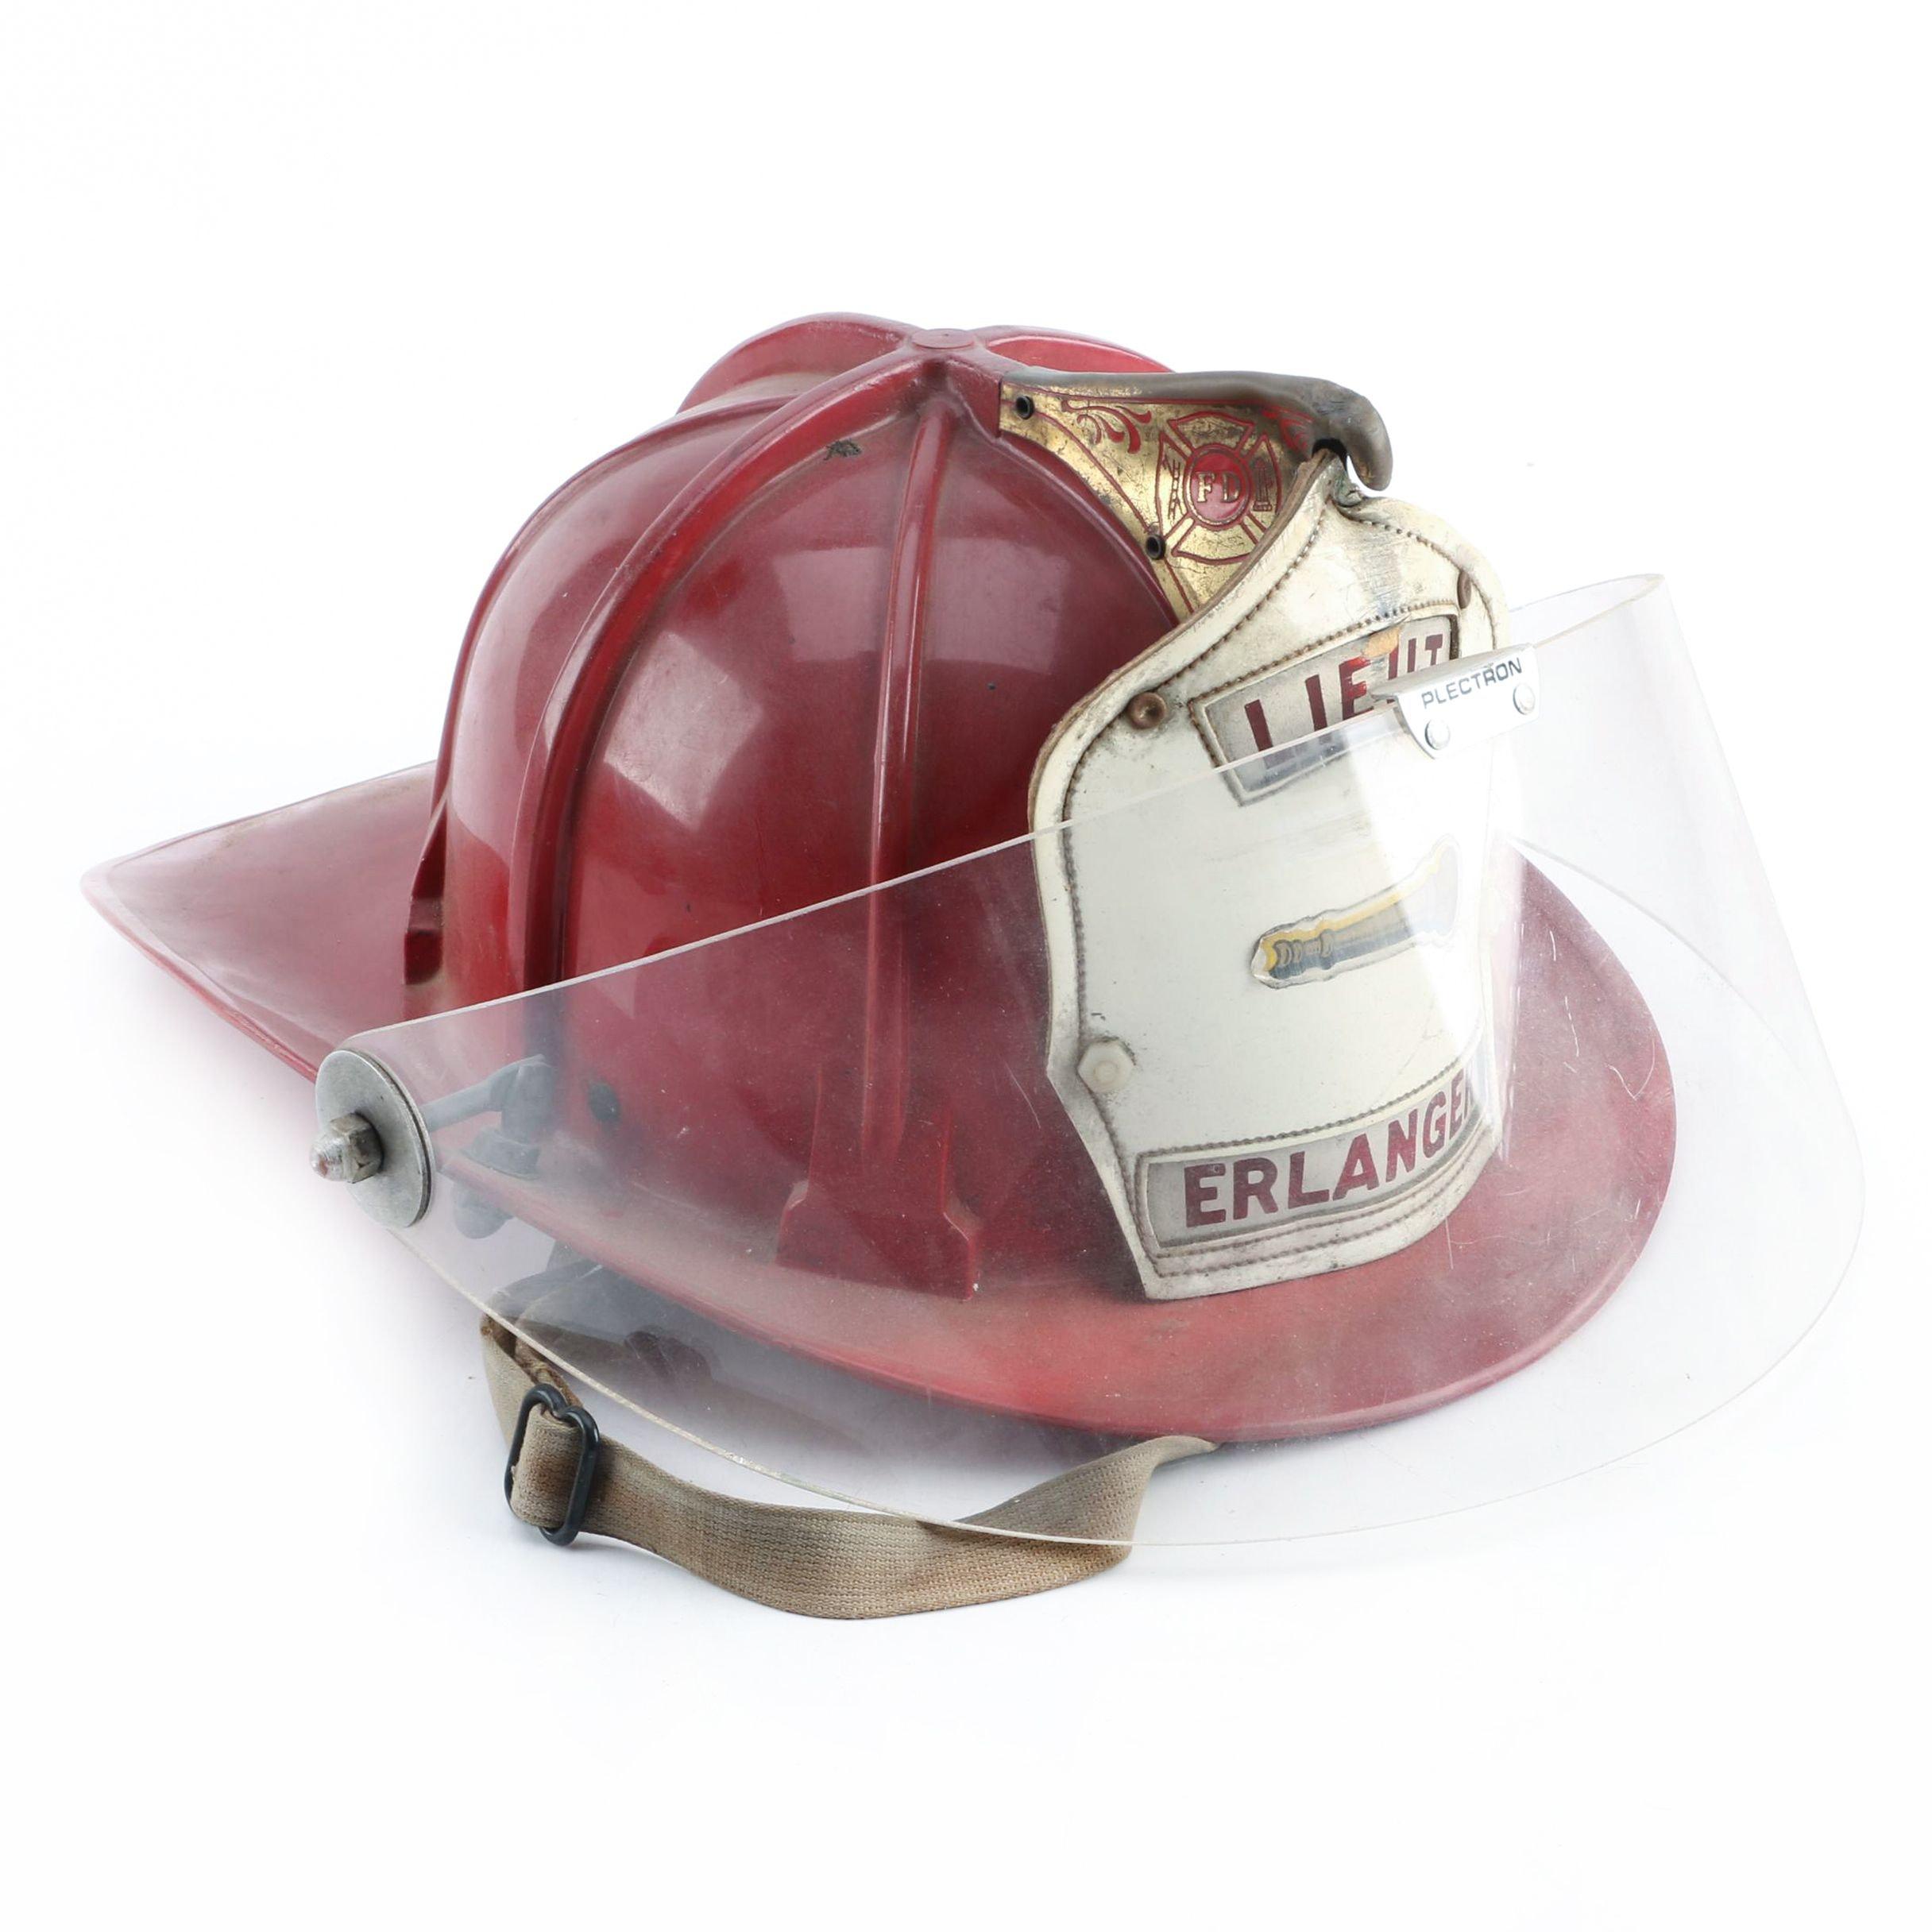 Vintage Fireman's Lieutenant Helmet